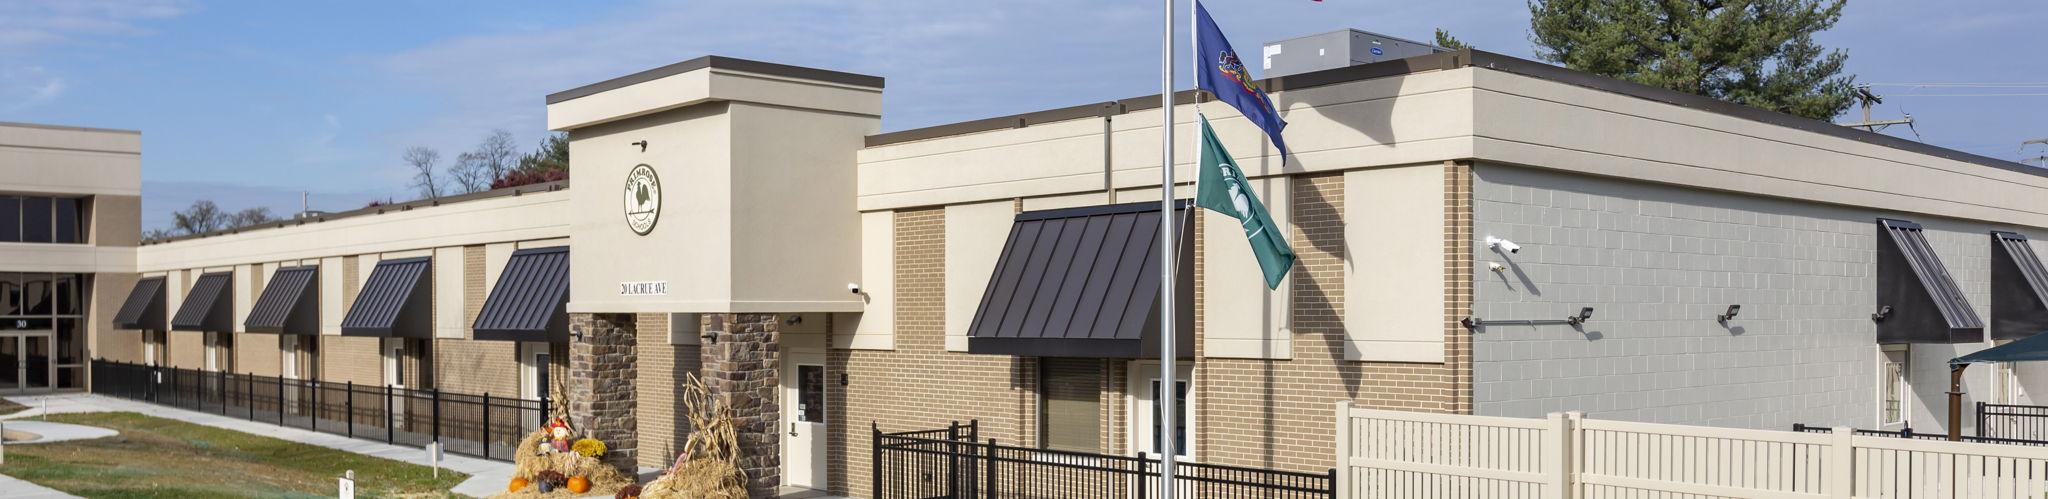 Exterior of Primrose School of Concordville